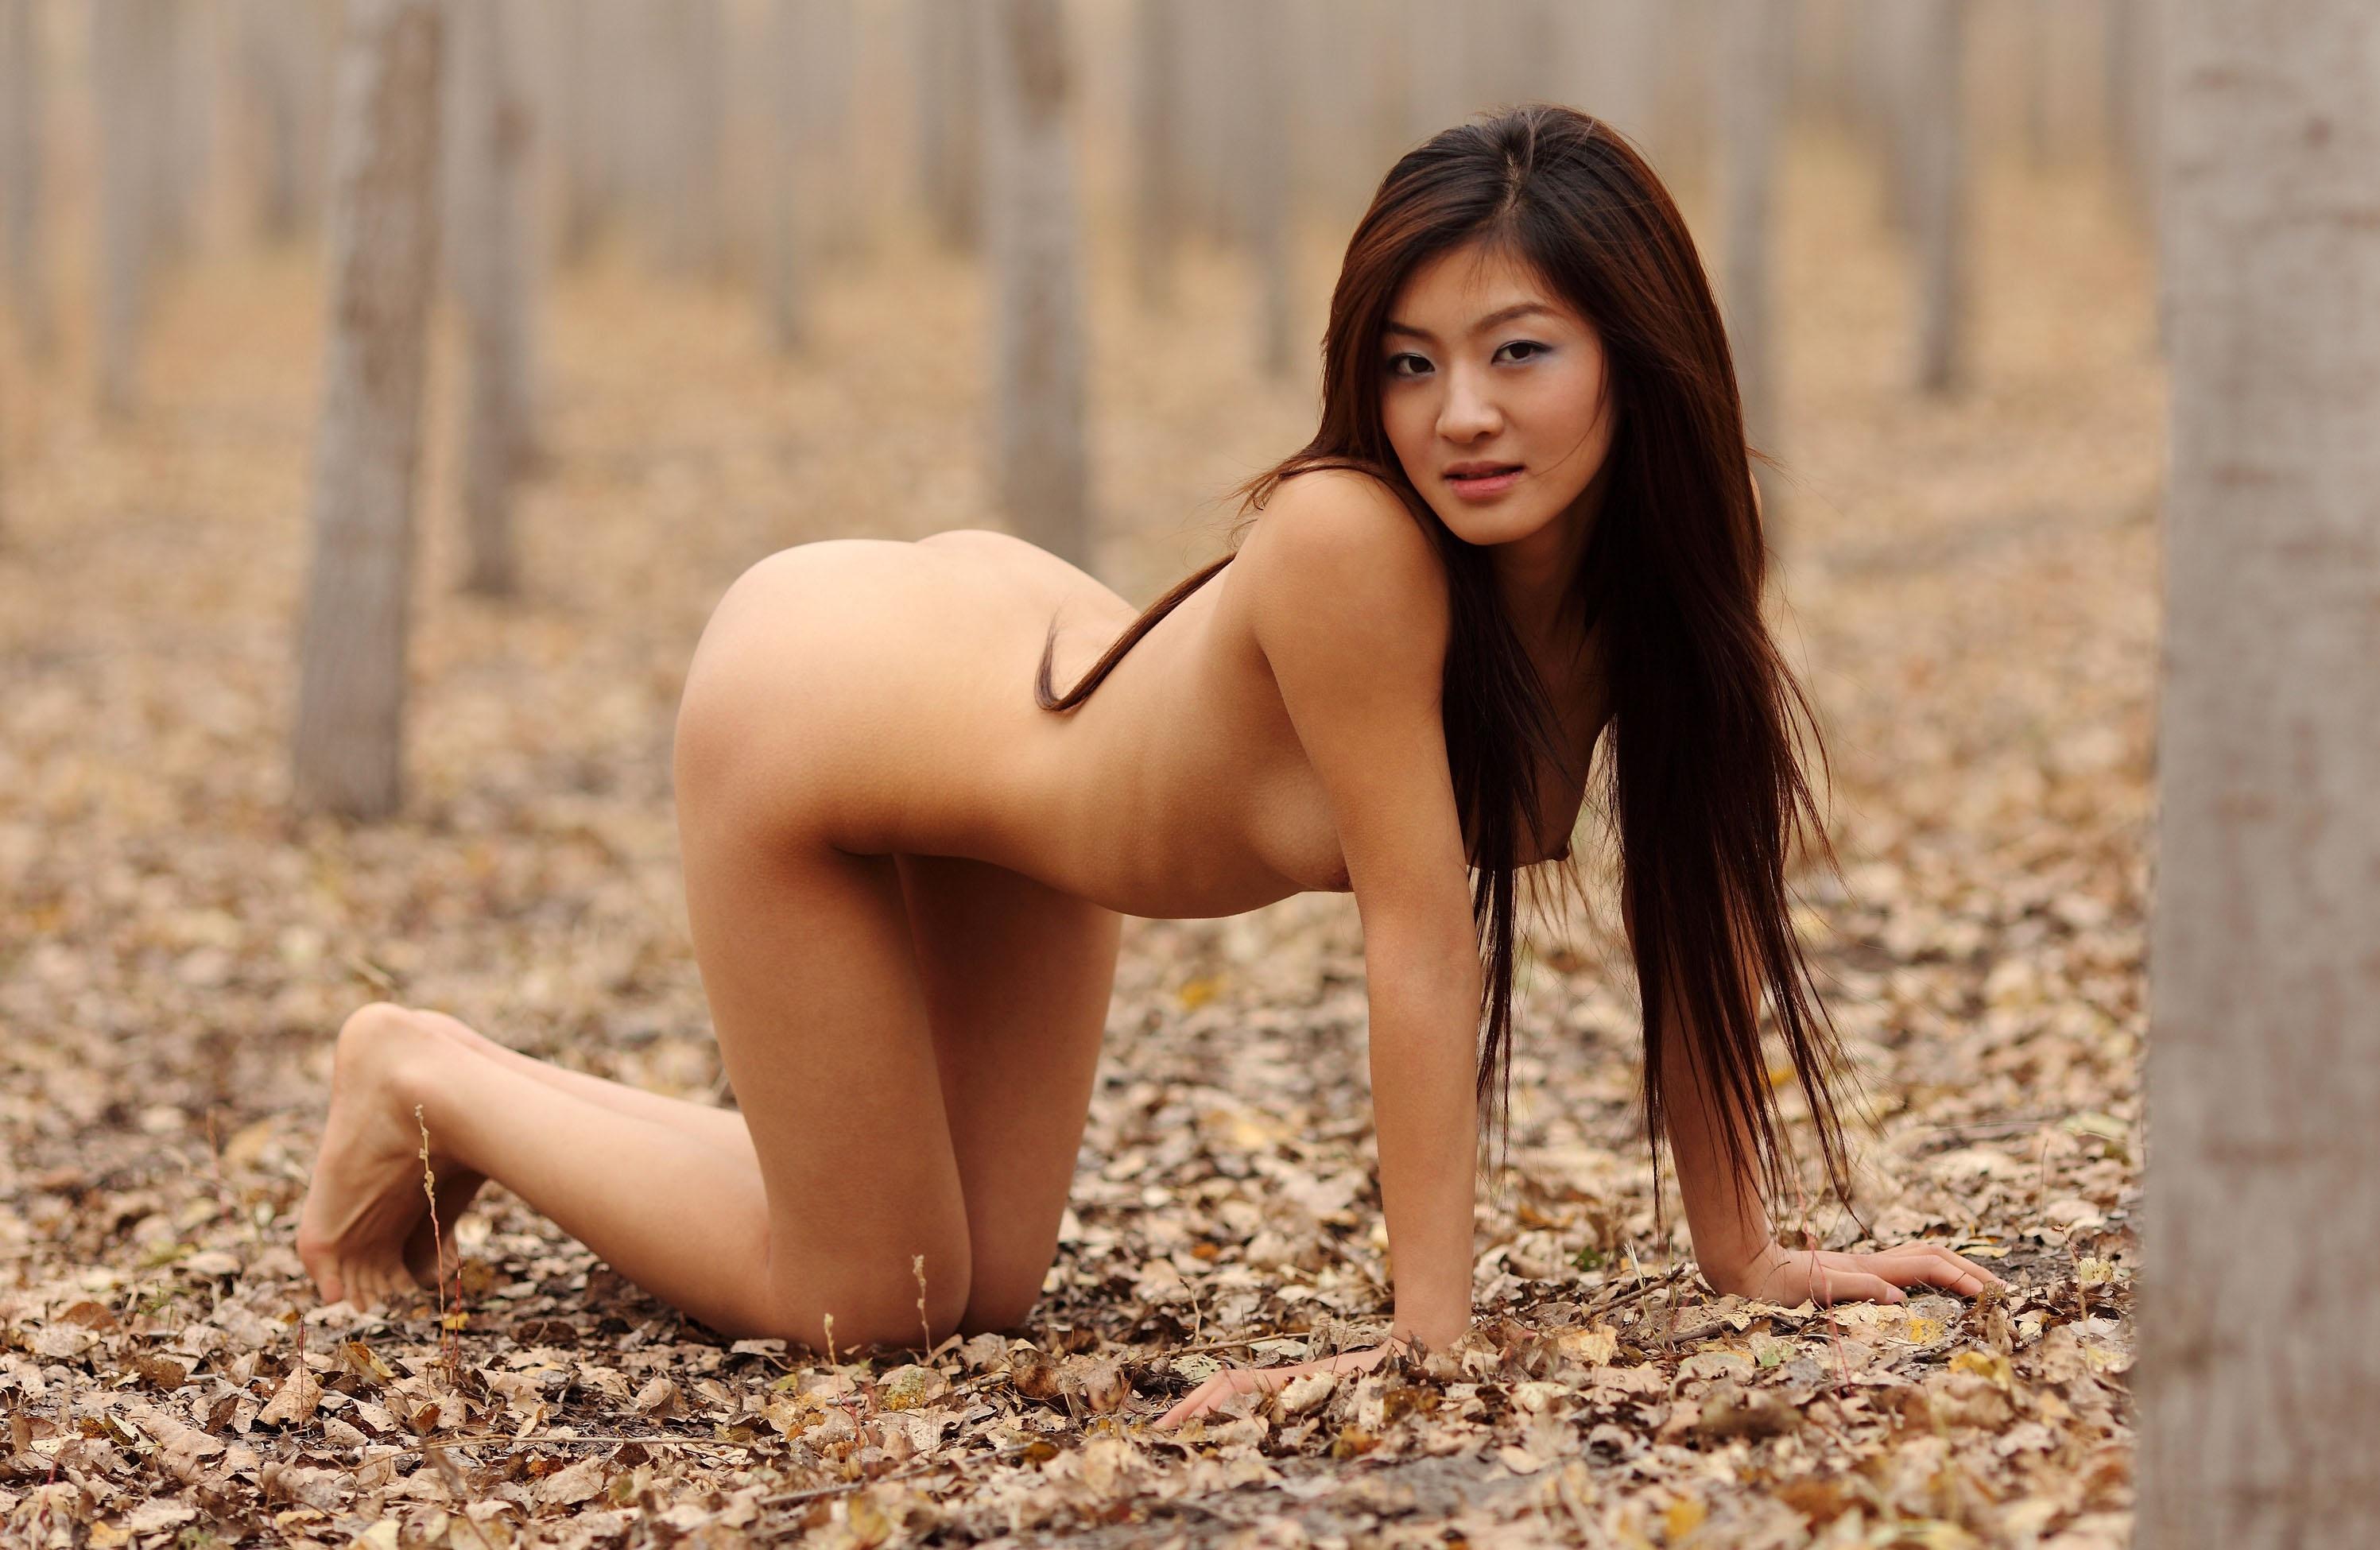 Asian babesnude, anne hatheway hot nipple xxx